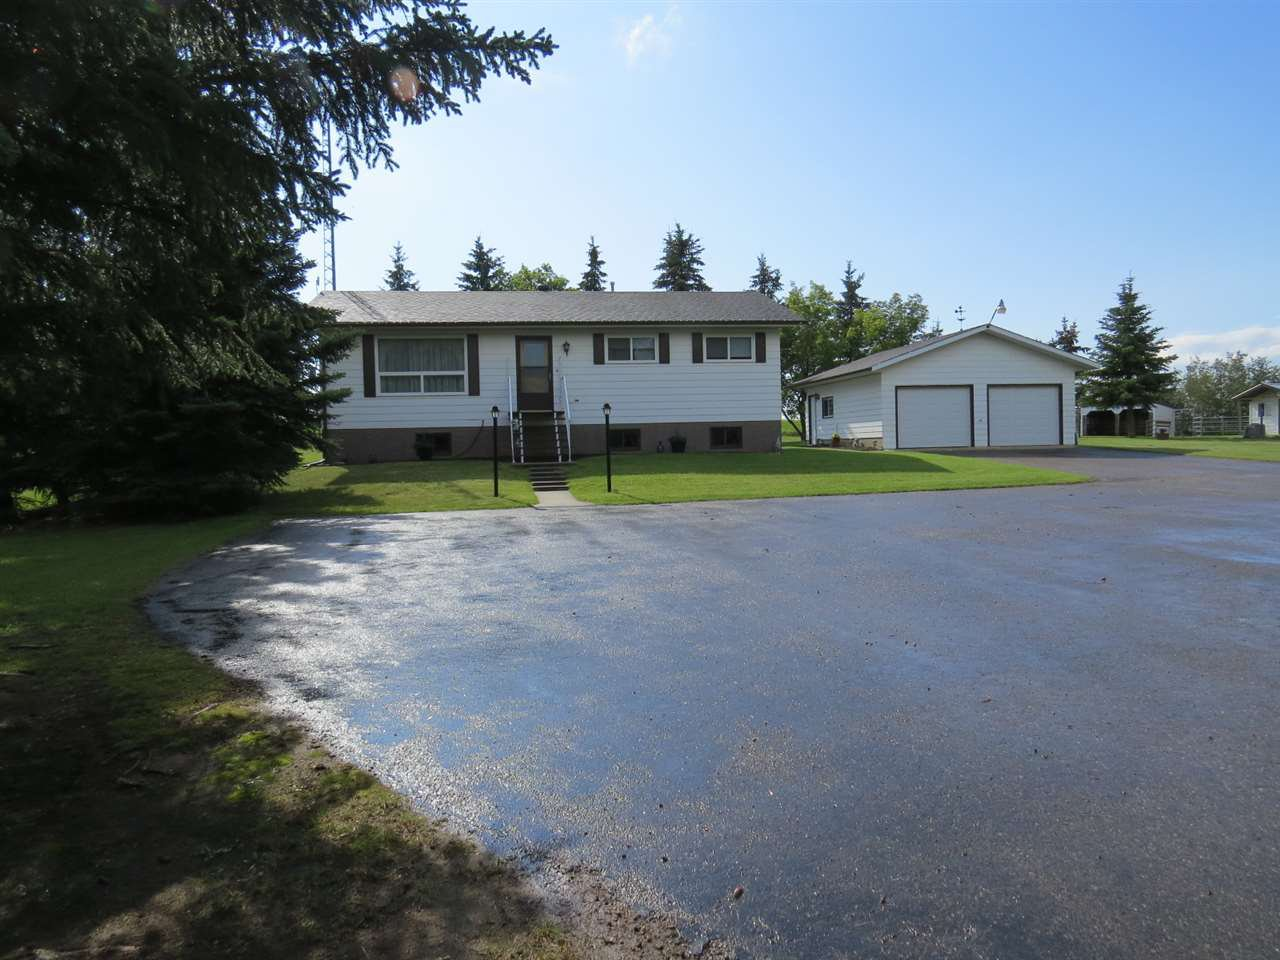 Main Photo: 4426 47 Street: Hardisty House for sale : MLS®# E4159302